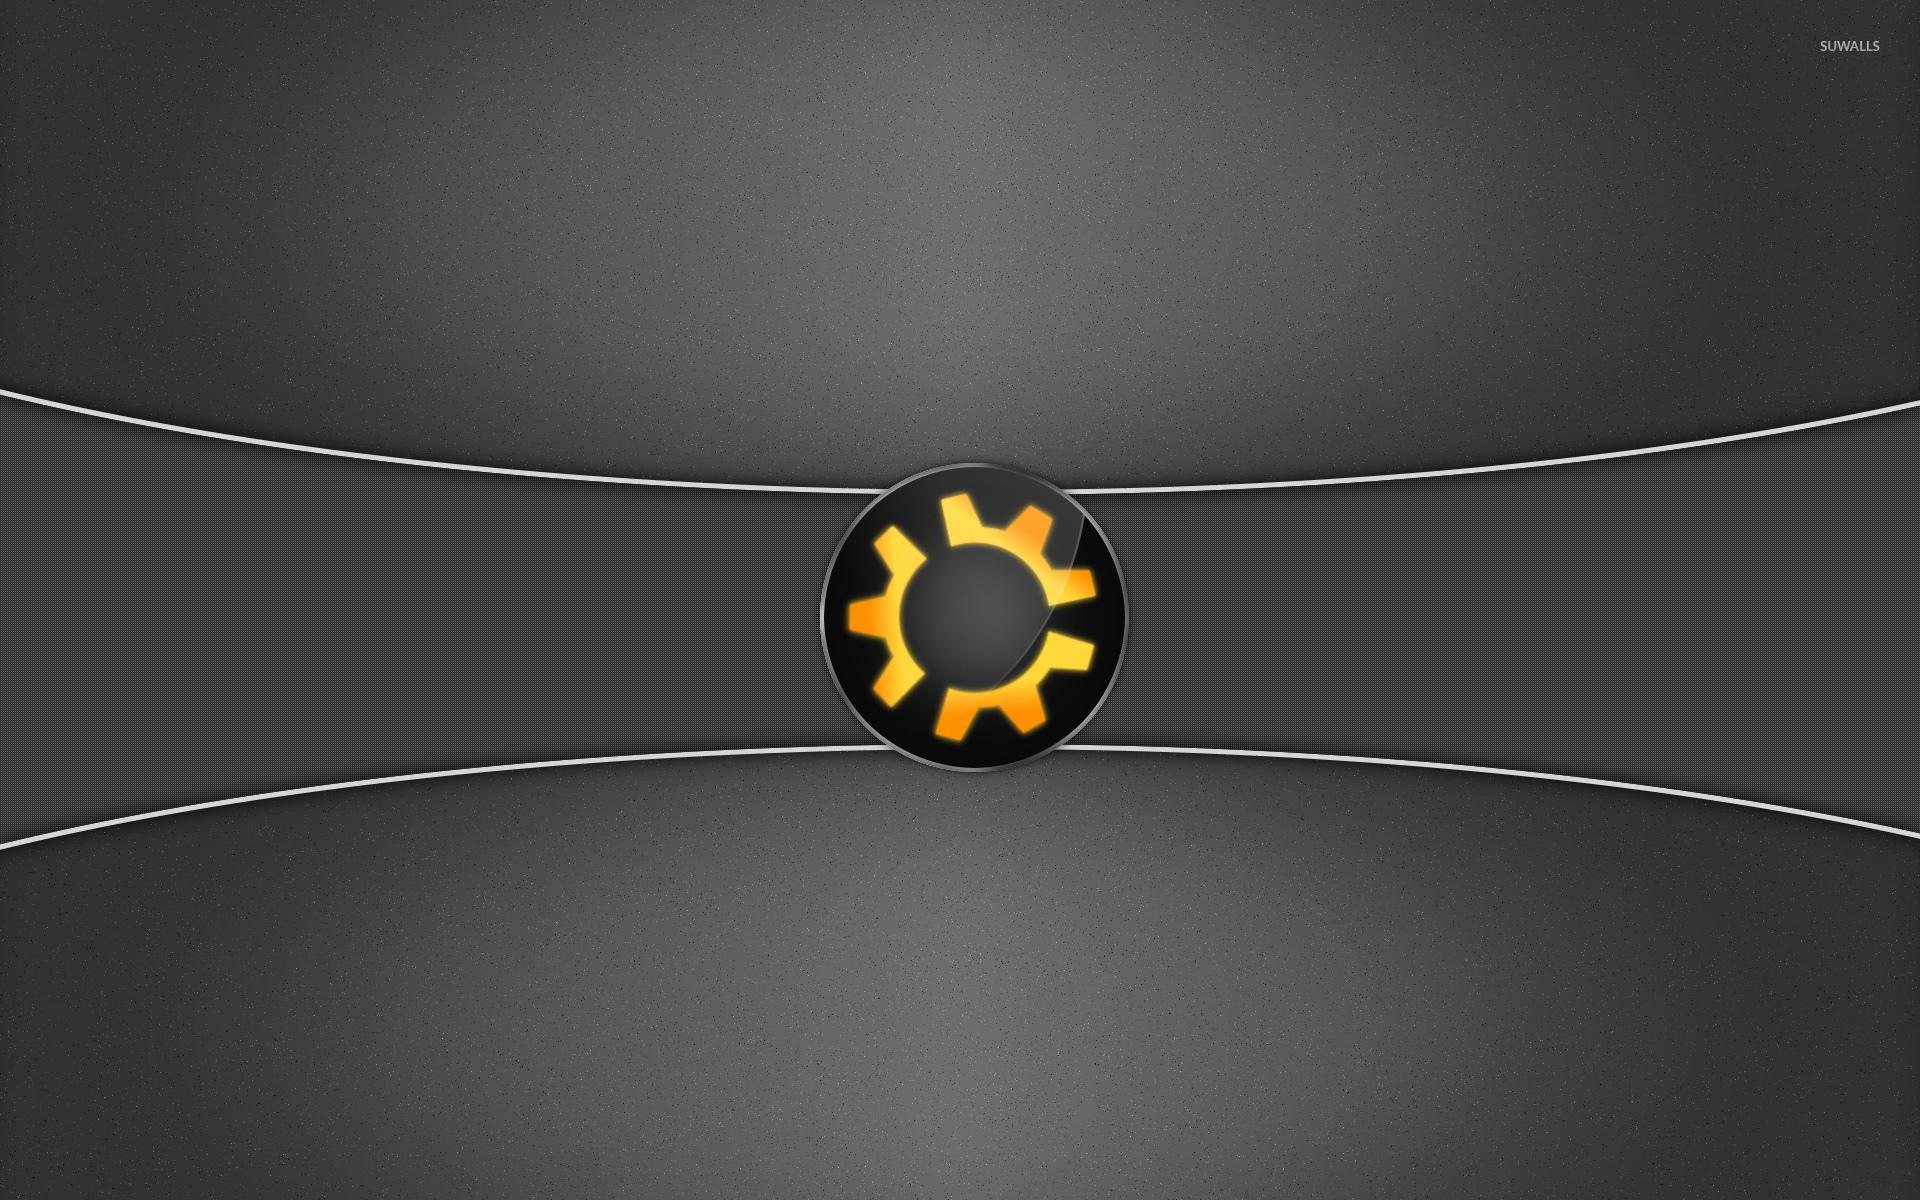 kubuntu wallpaper 1920x1080 -#main